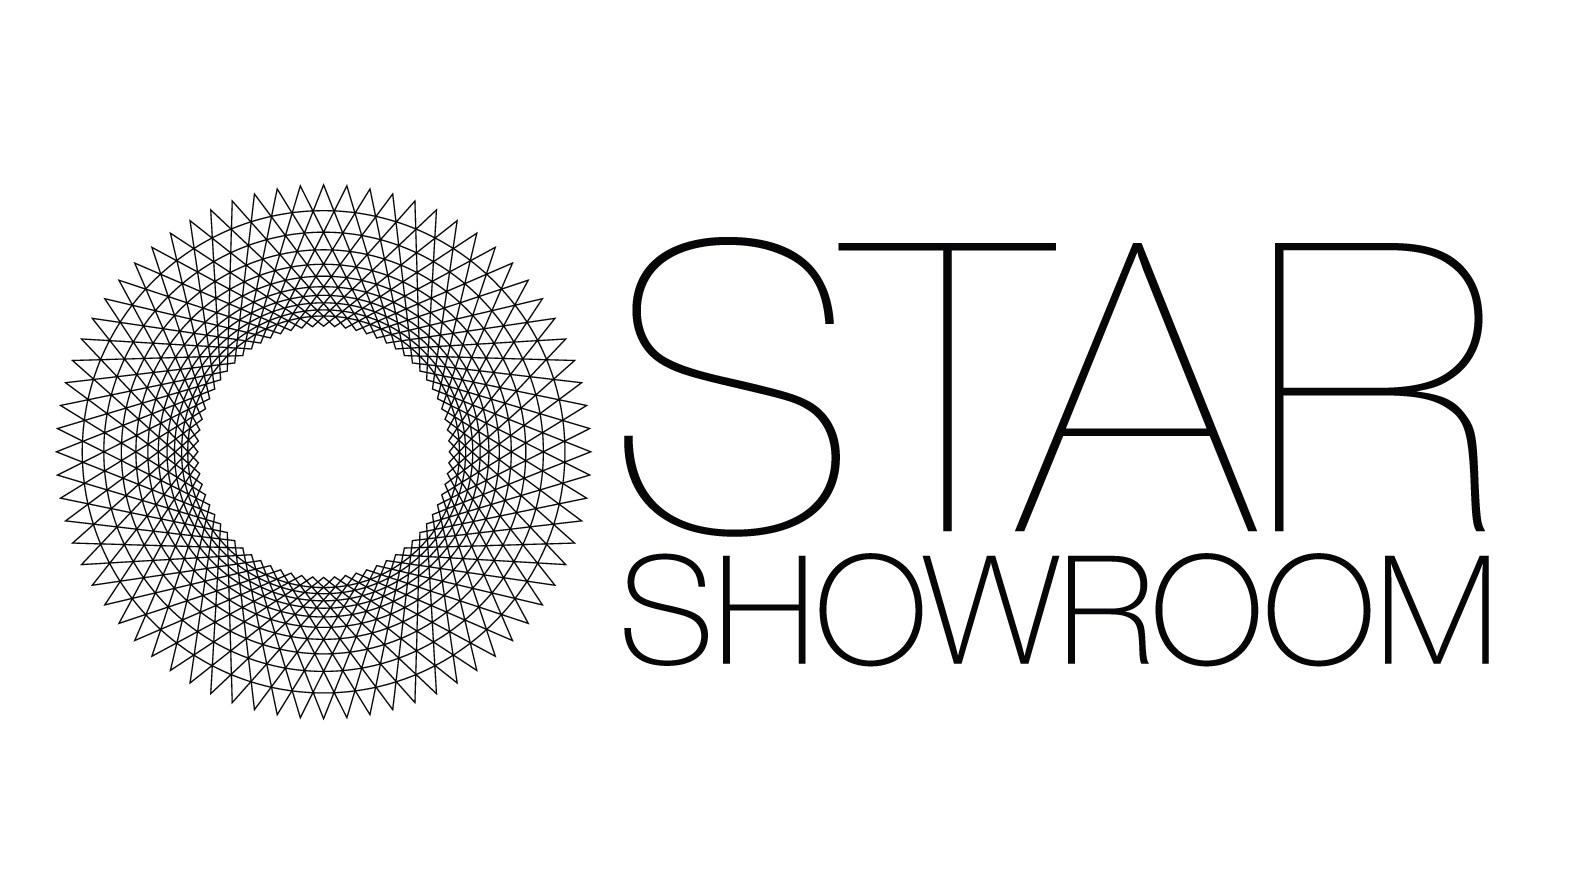 www.starshowroom.coLogo